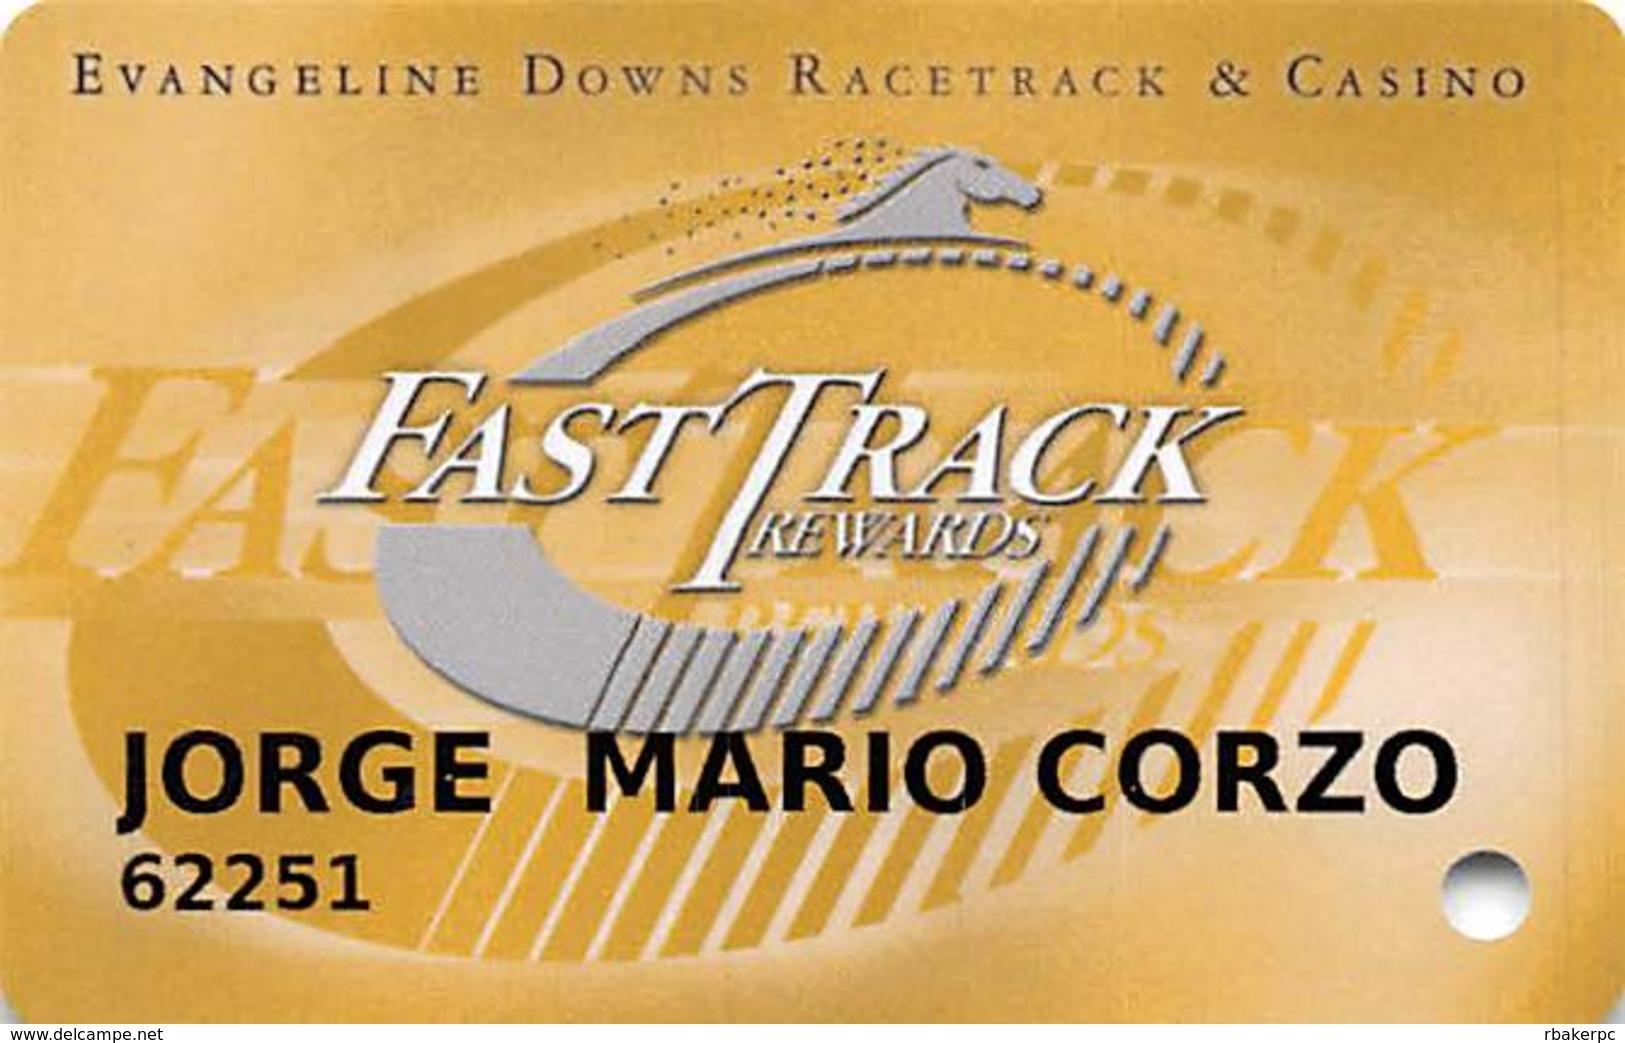 Evangeline Downs Opelousas LA FastTrack Rewards Slot Card - White Horse Logo On Back - Casino Cards